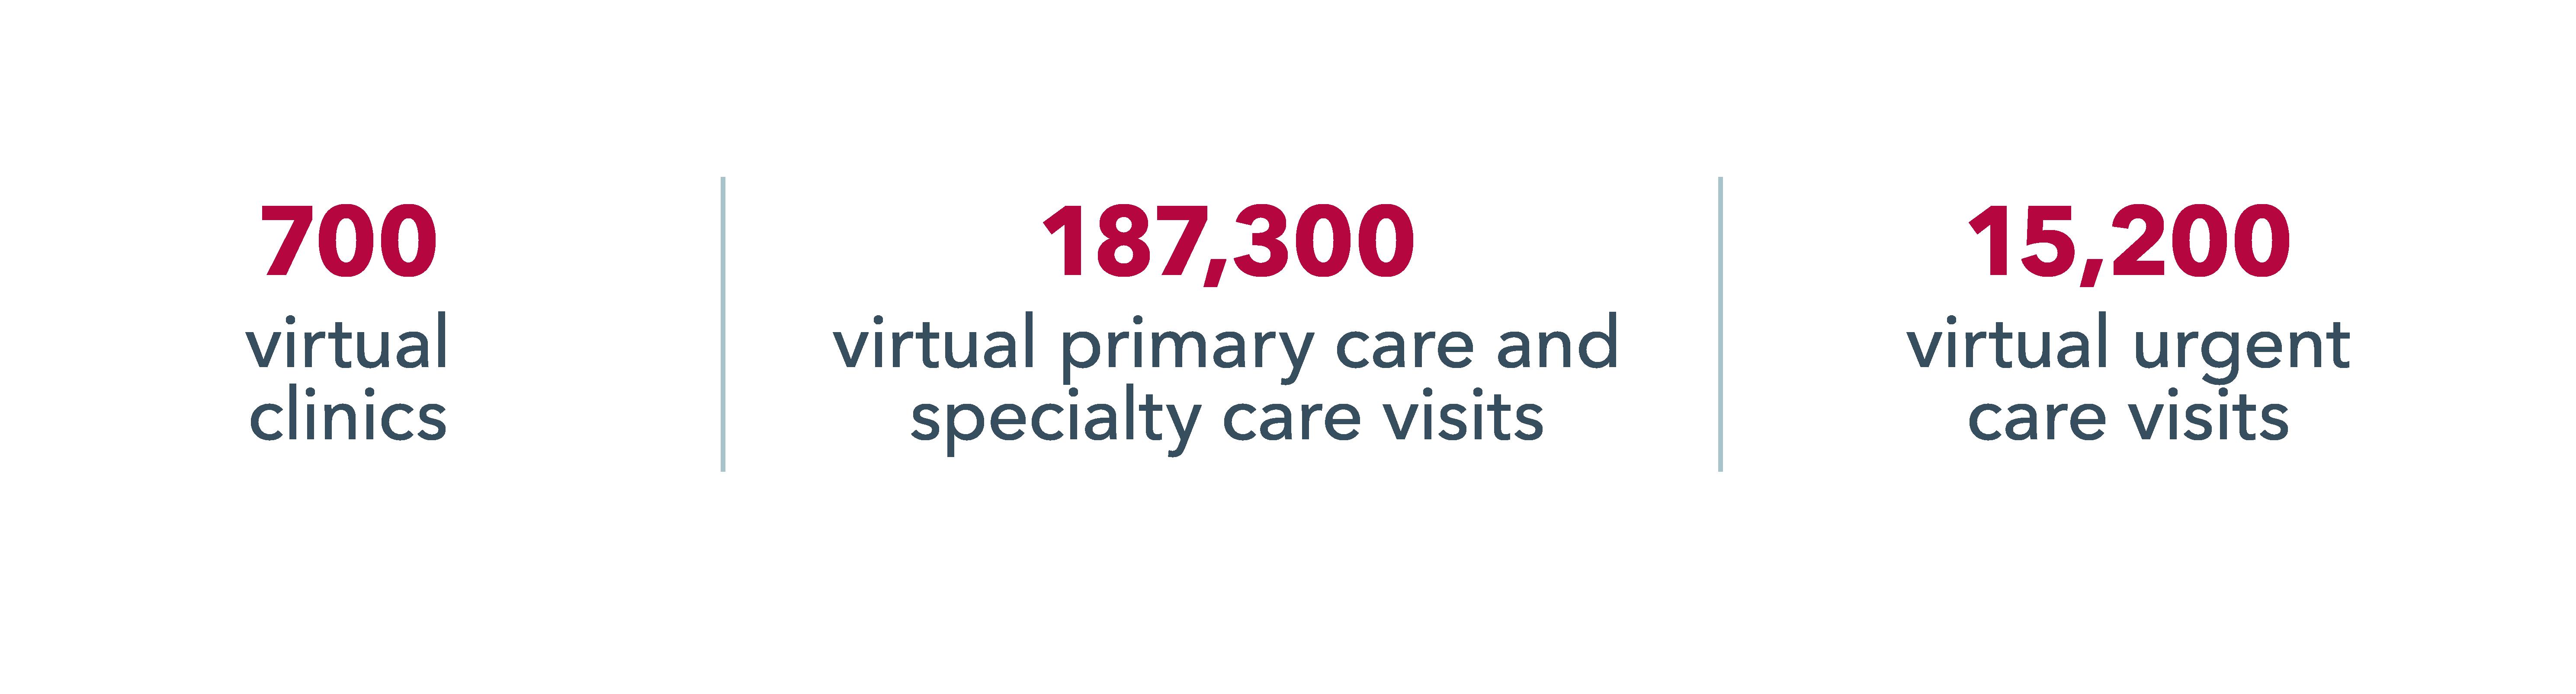 UCHealth virtual care data